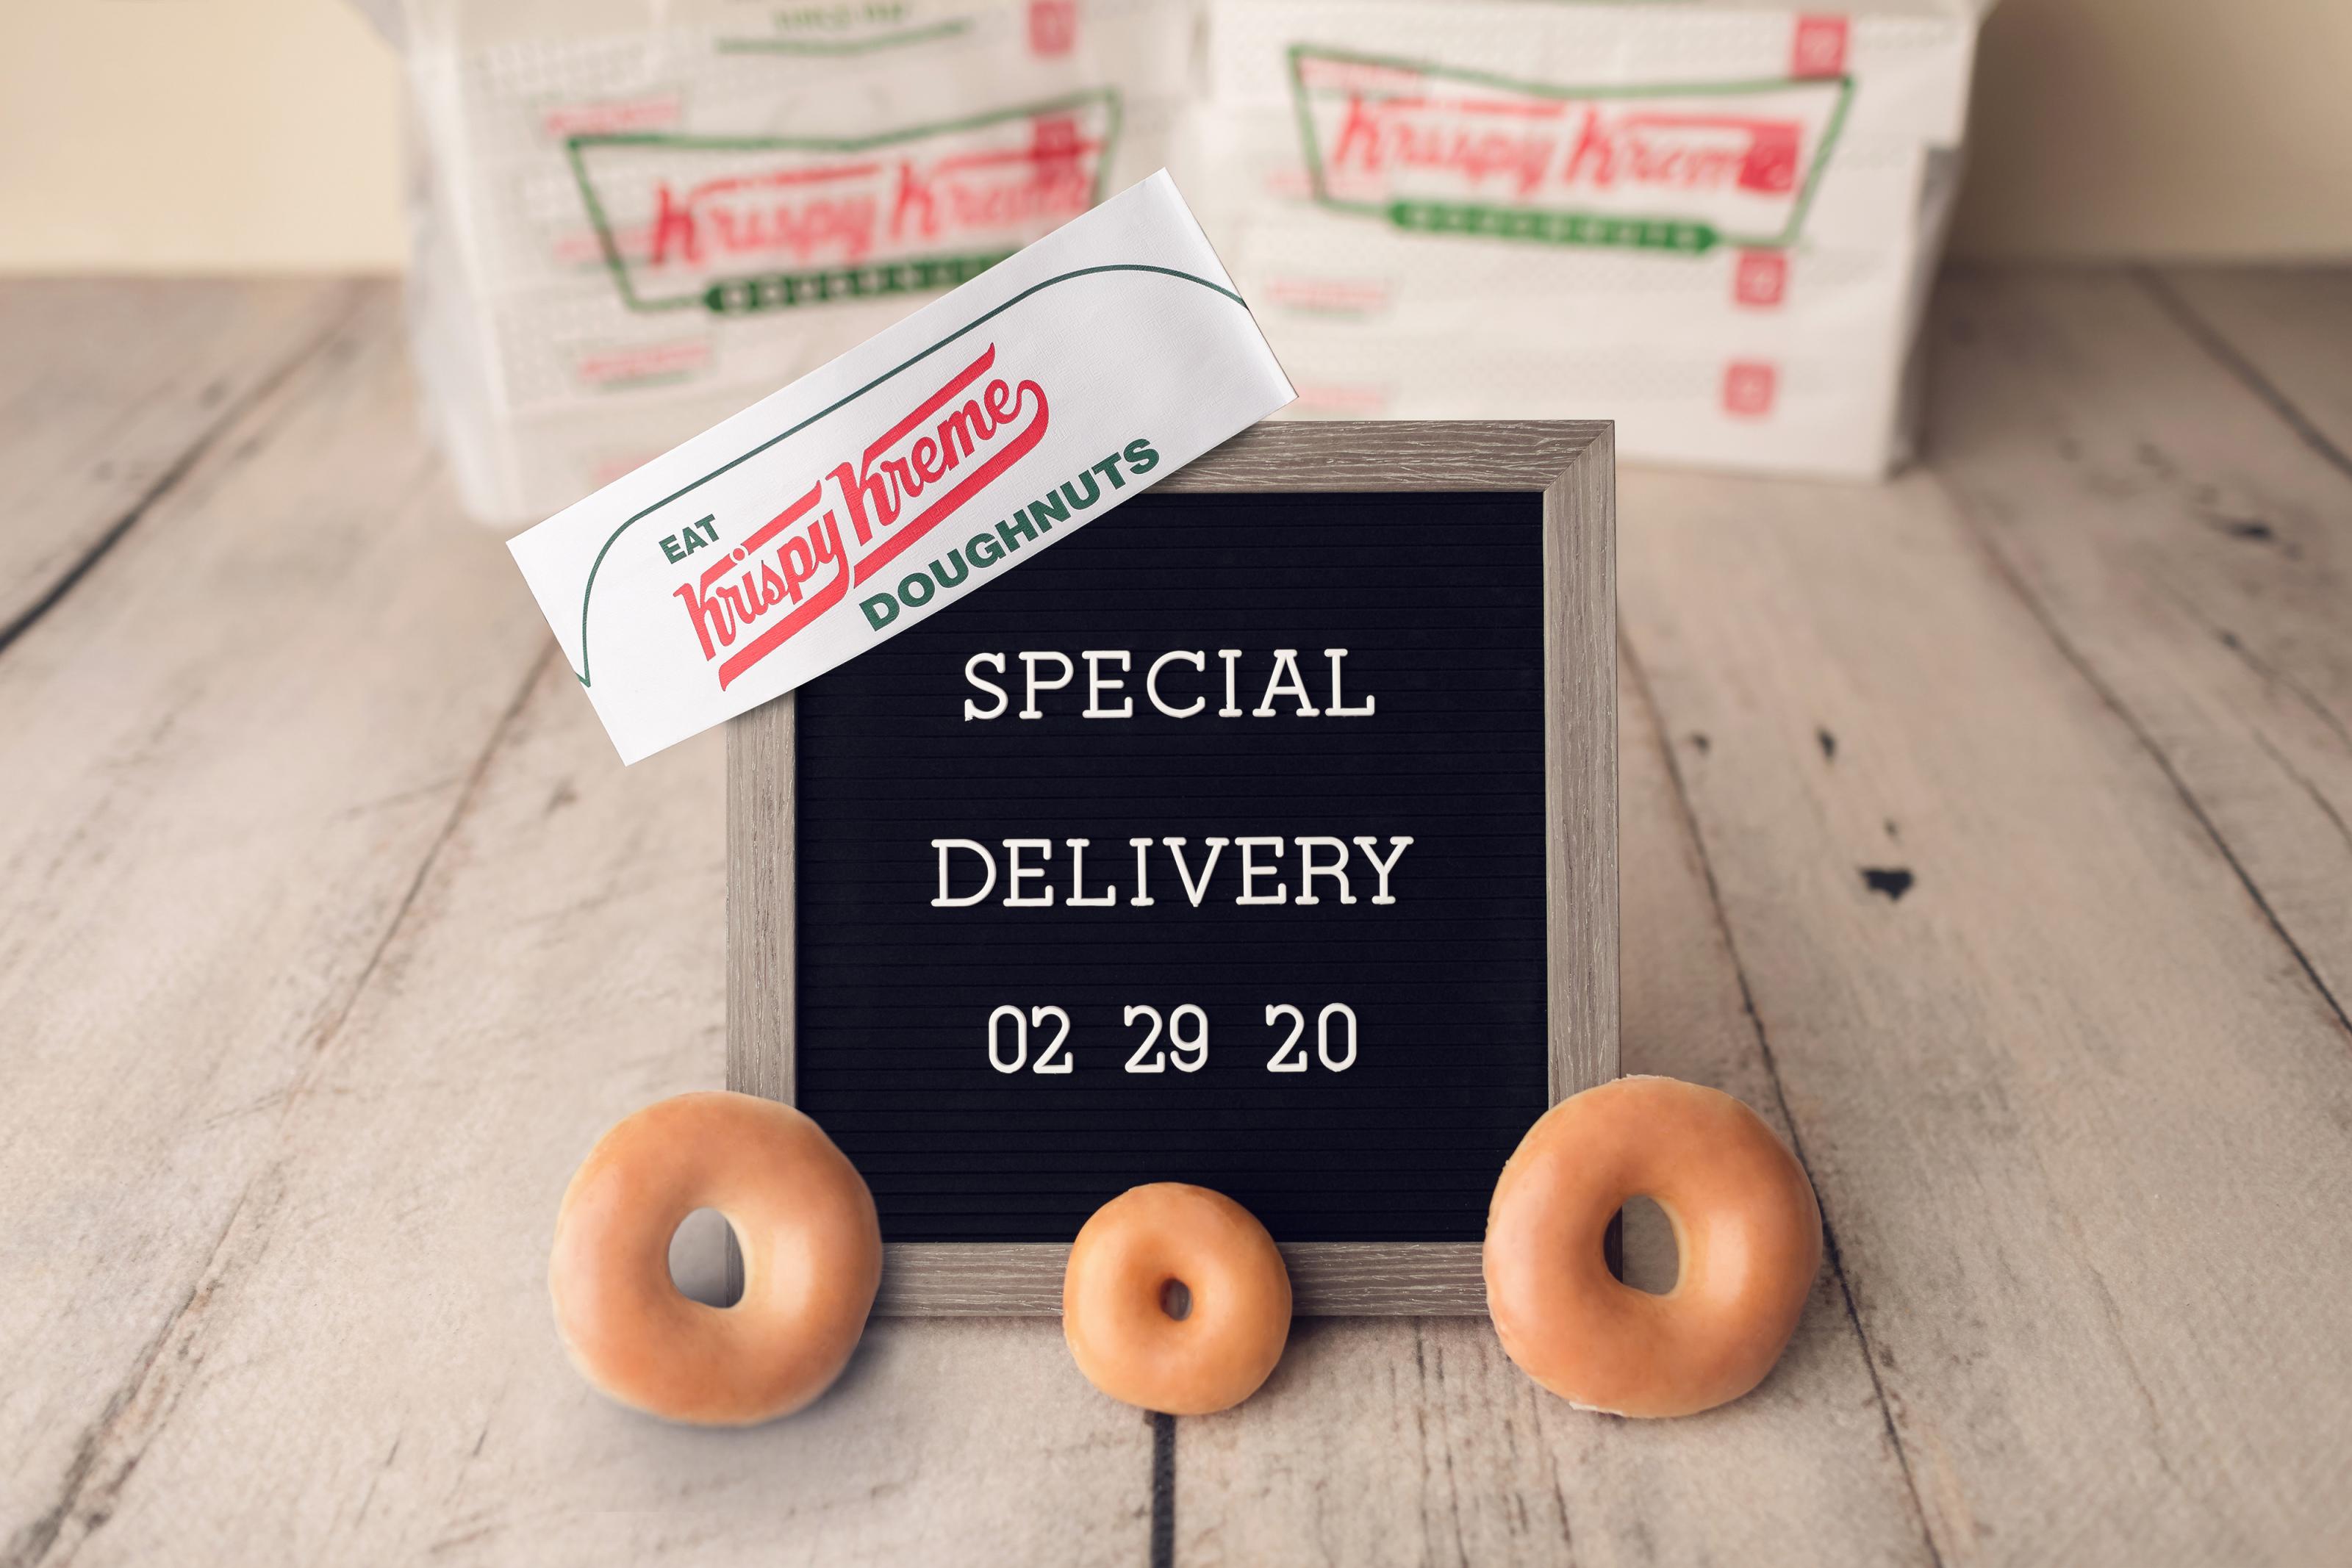 Krispy Kreme now bringing donuts to your door